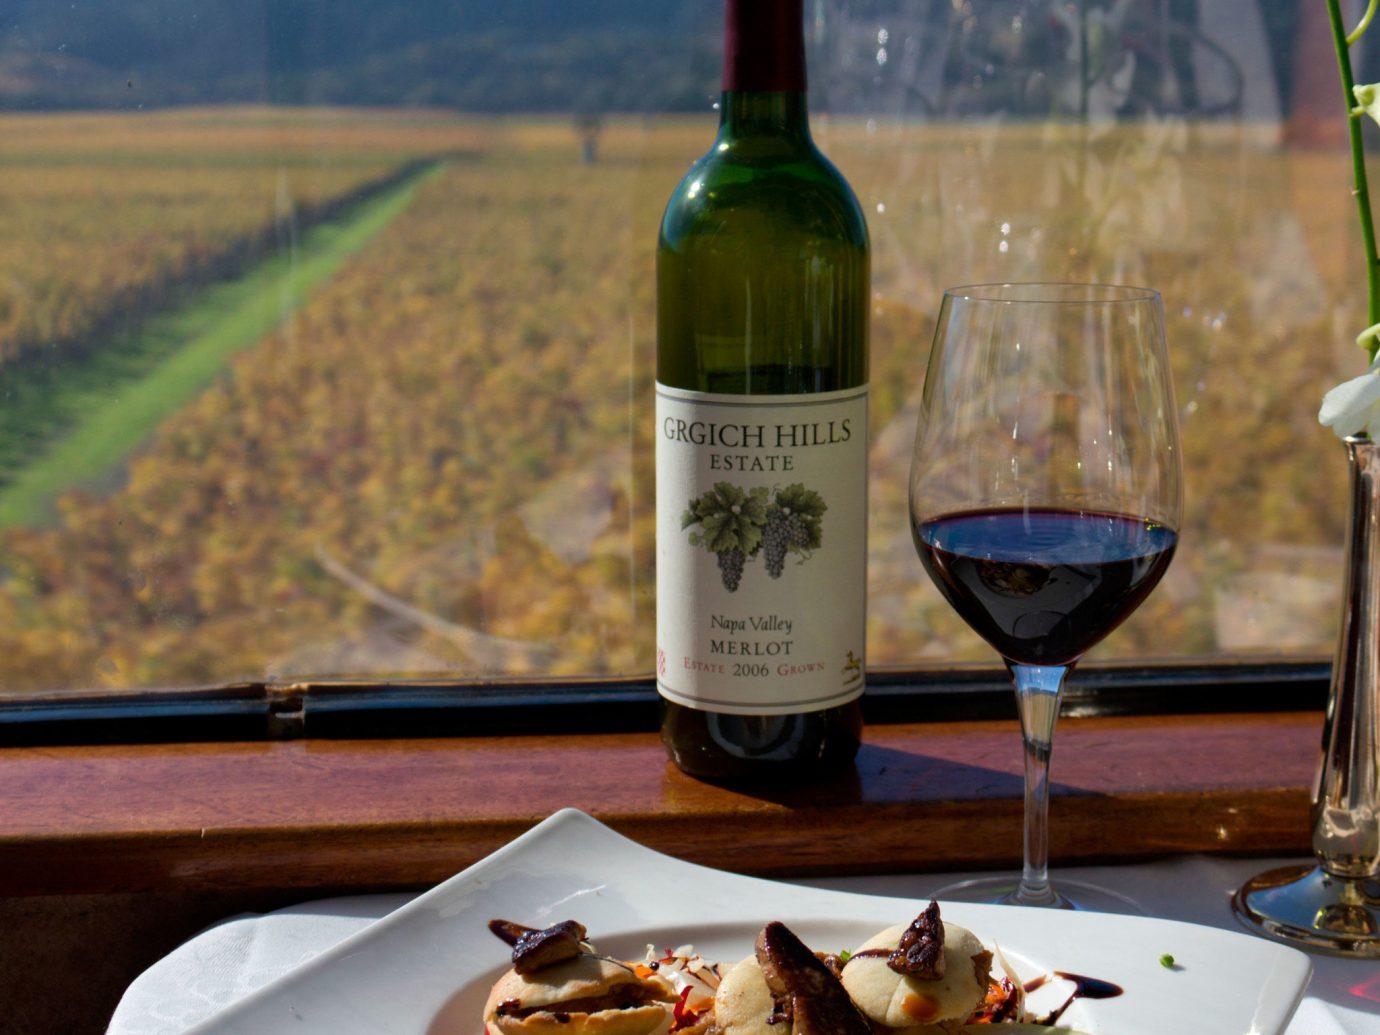 Romance Trip Ideas table wine food plate meal Drink restaurant sense